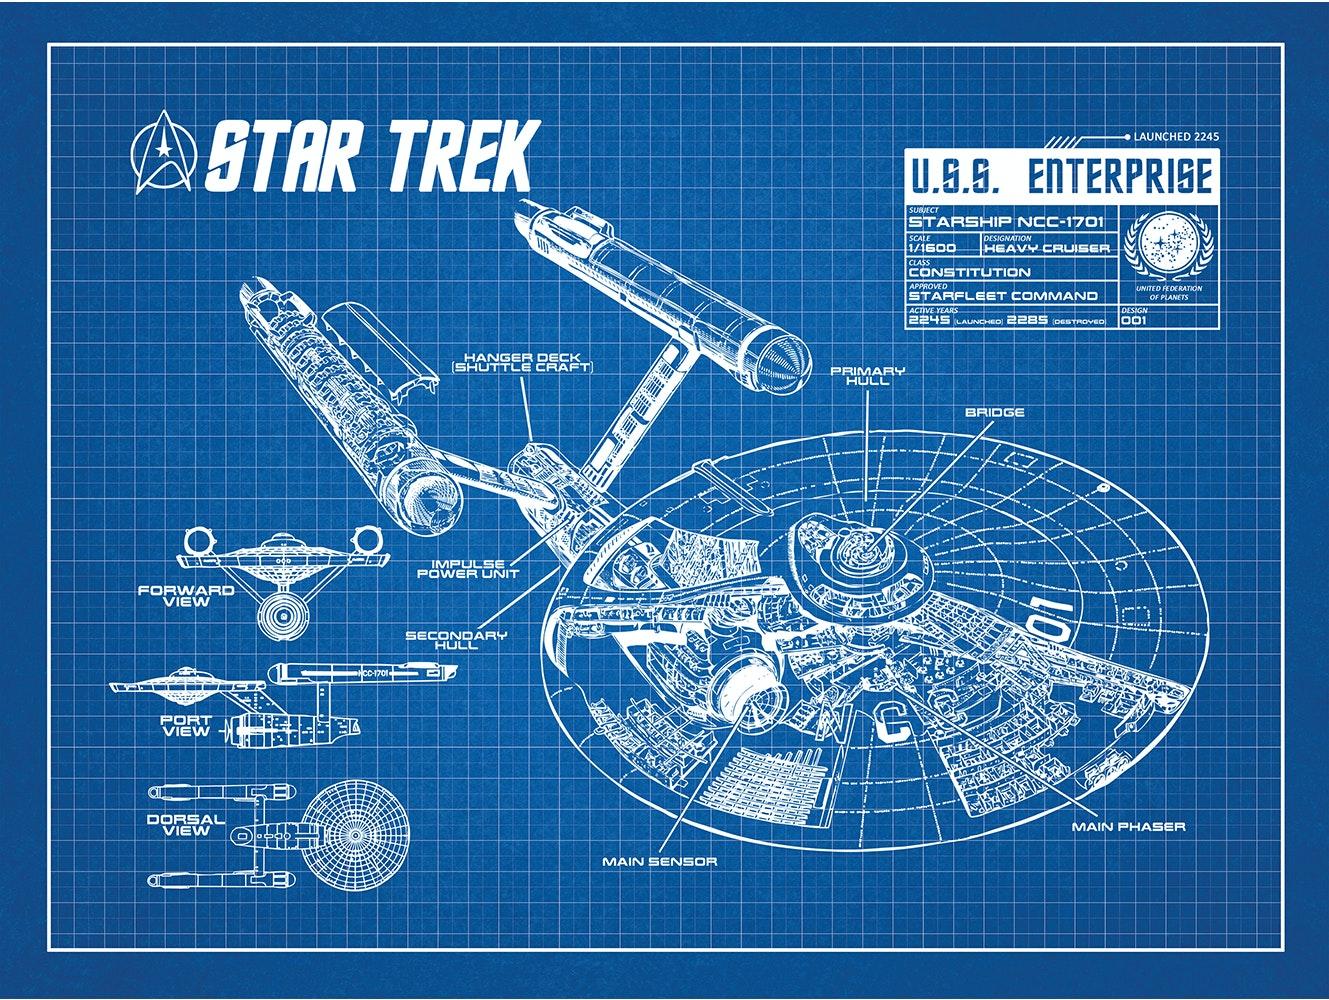 Star Trek - U.S.S. Enterprise Blueprint